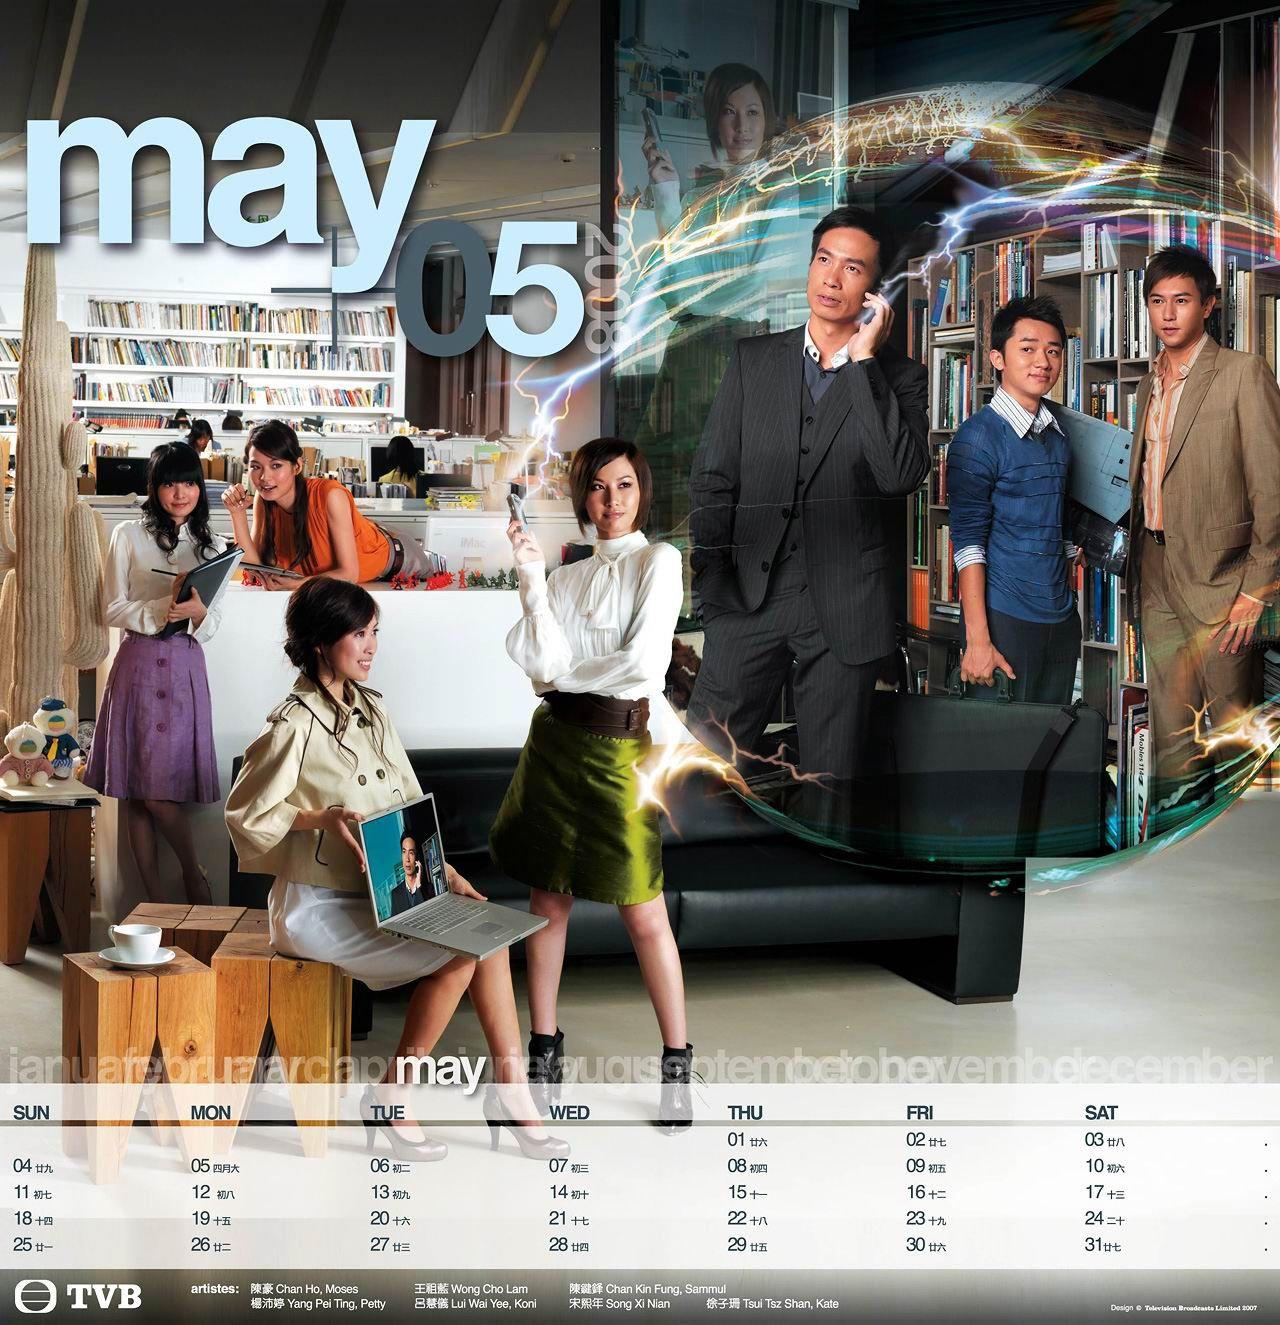 Hong Kong TVB calendar May 2008